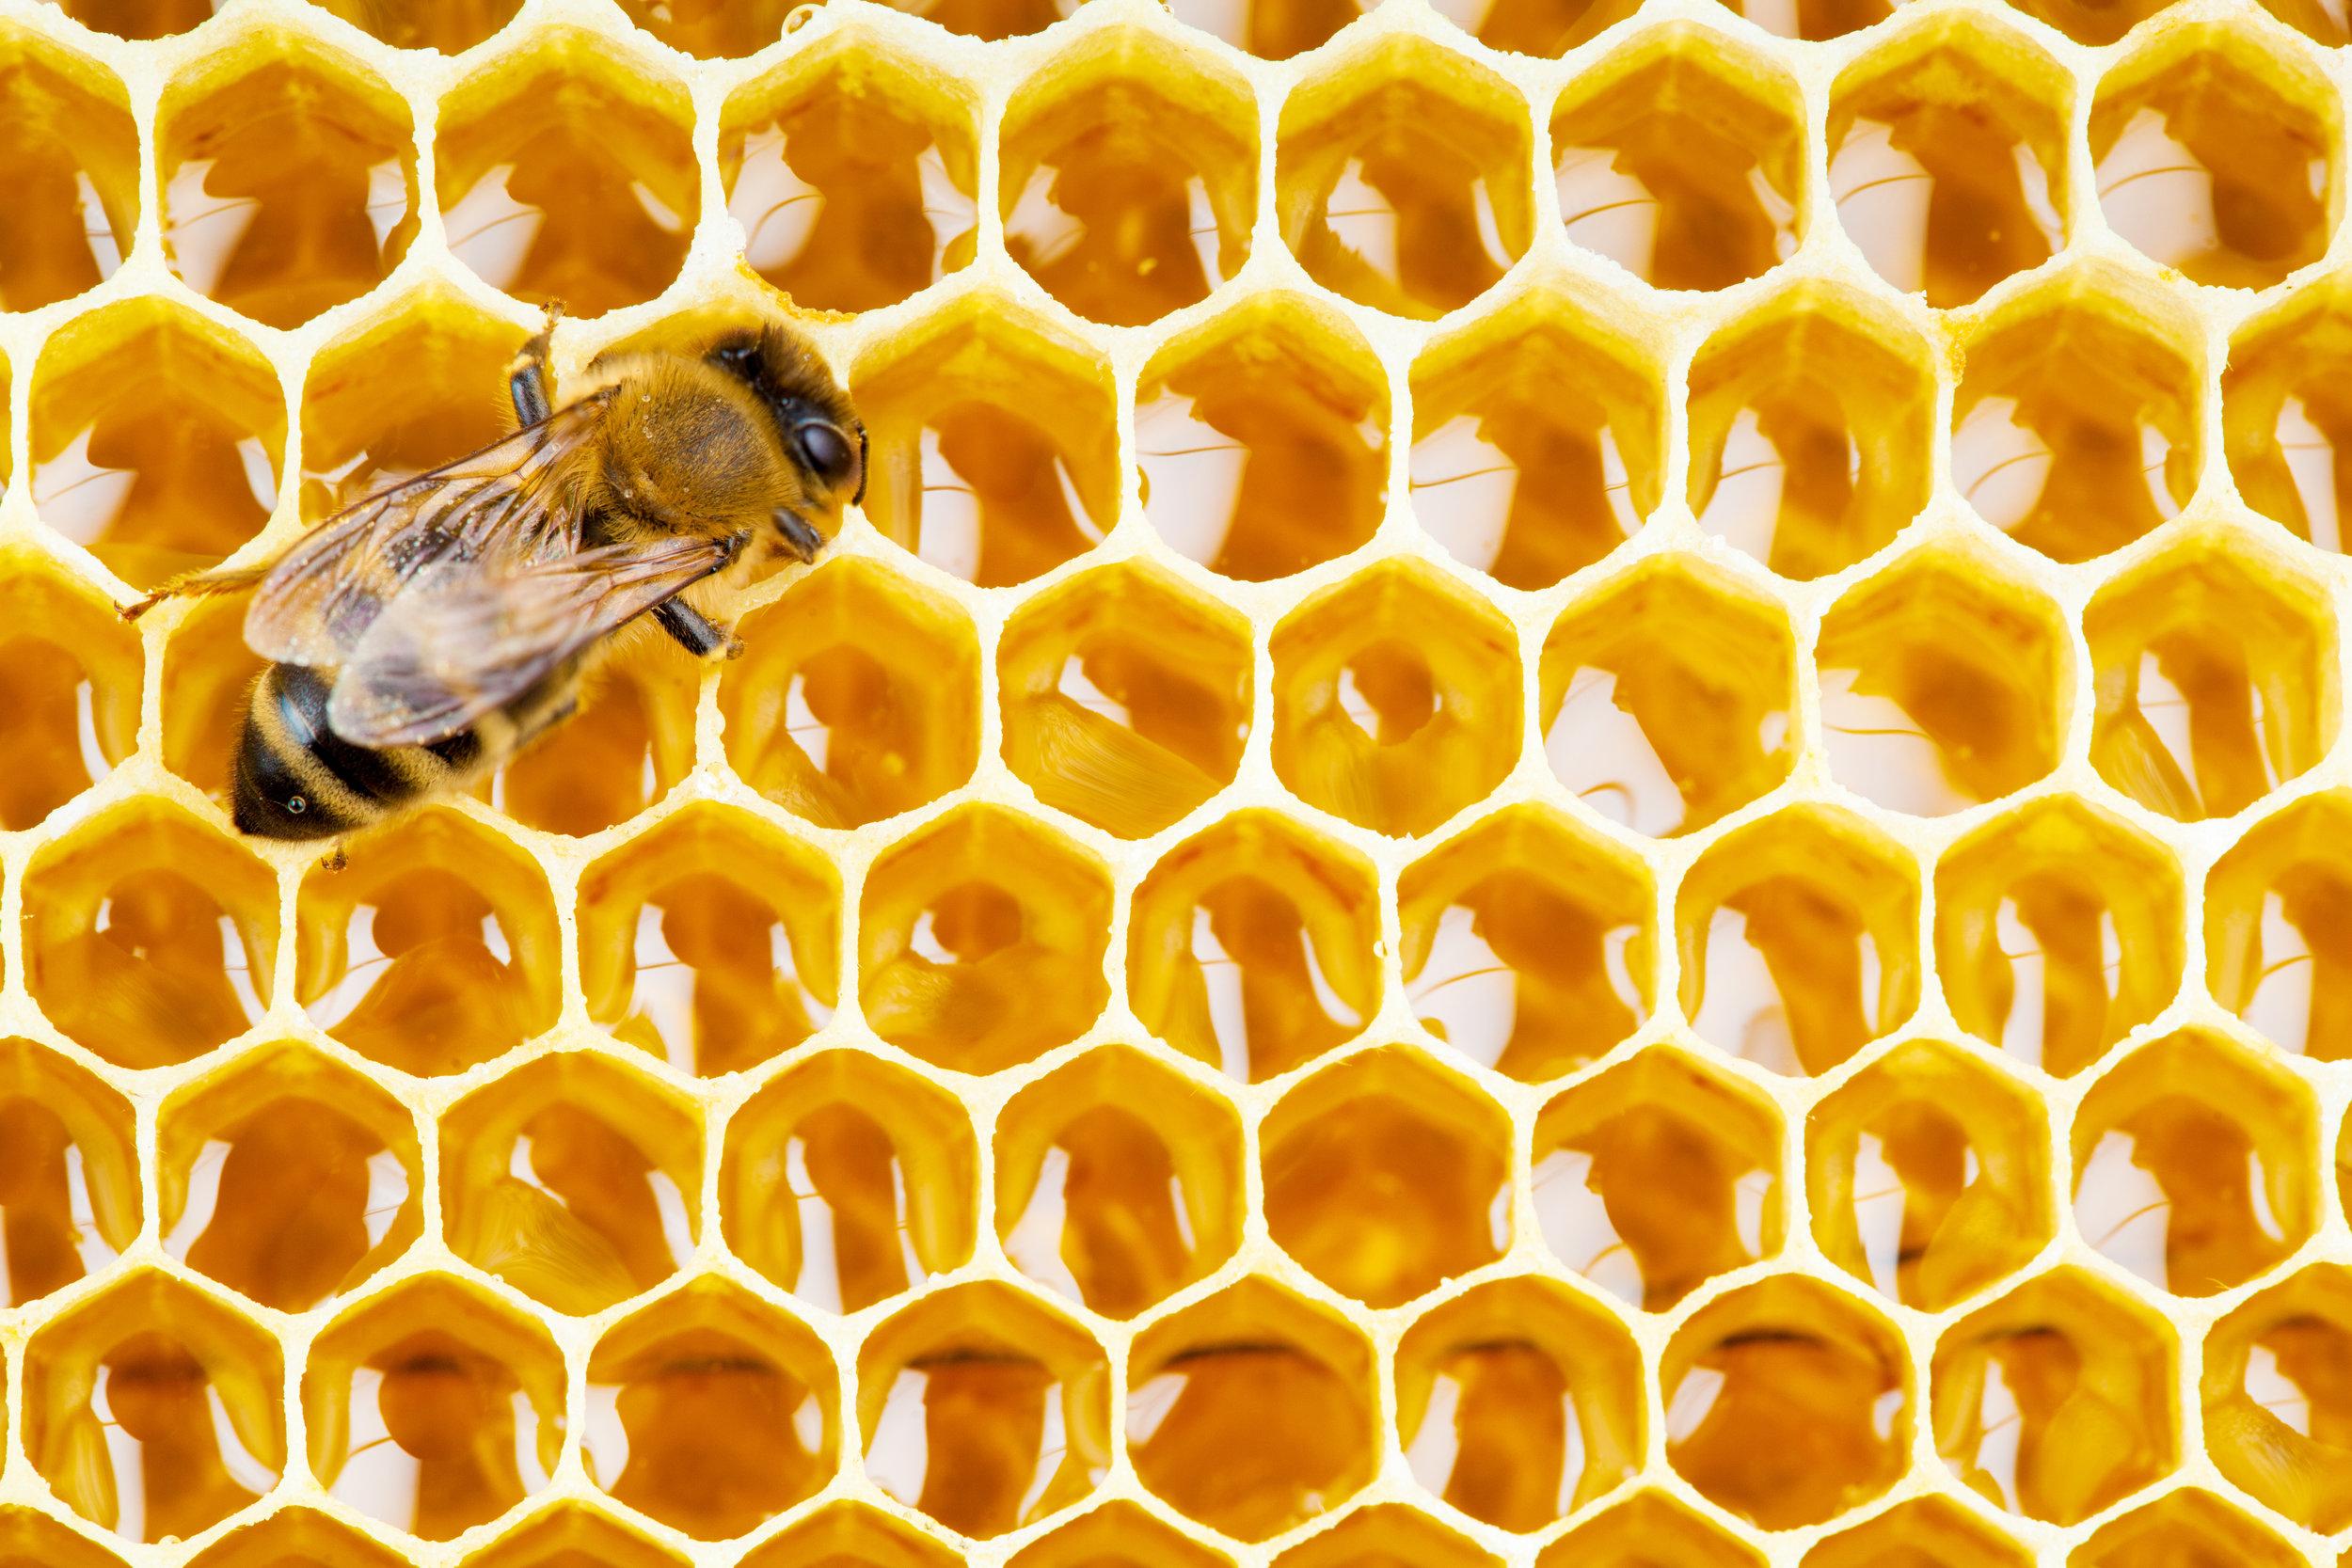 A really Cute Bee